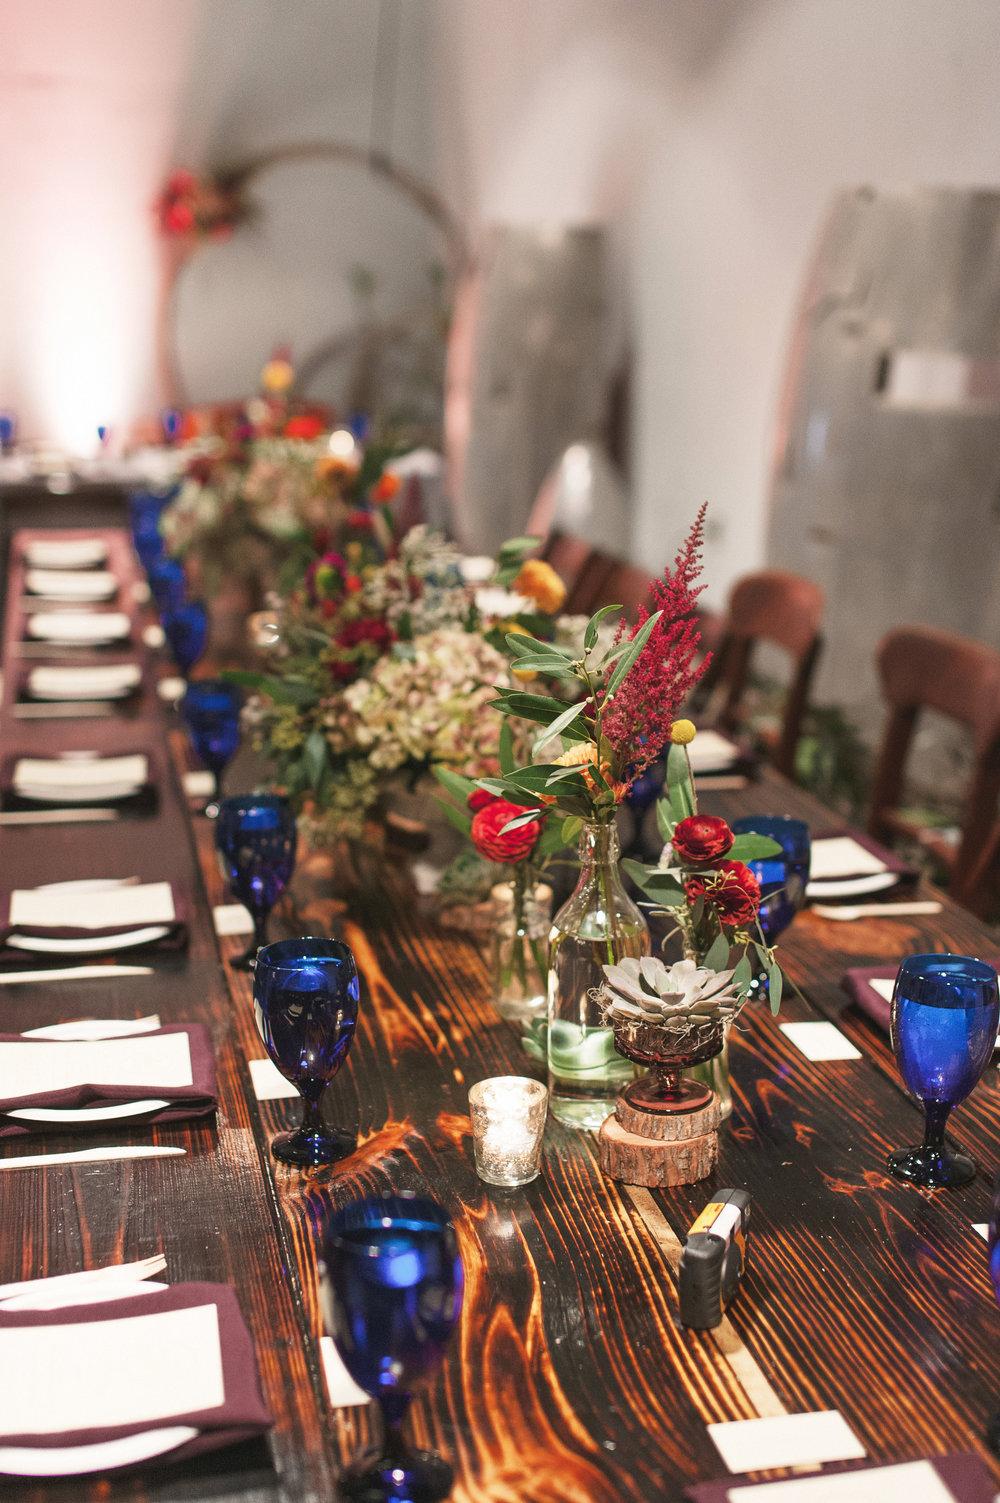 vuka wedding table setting closeup blue glasses.jpg